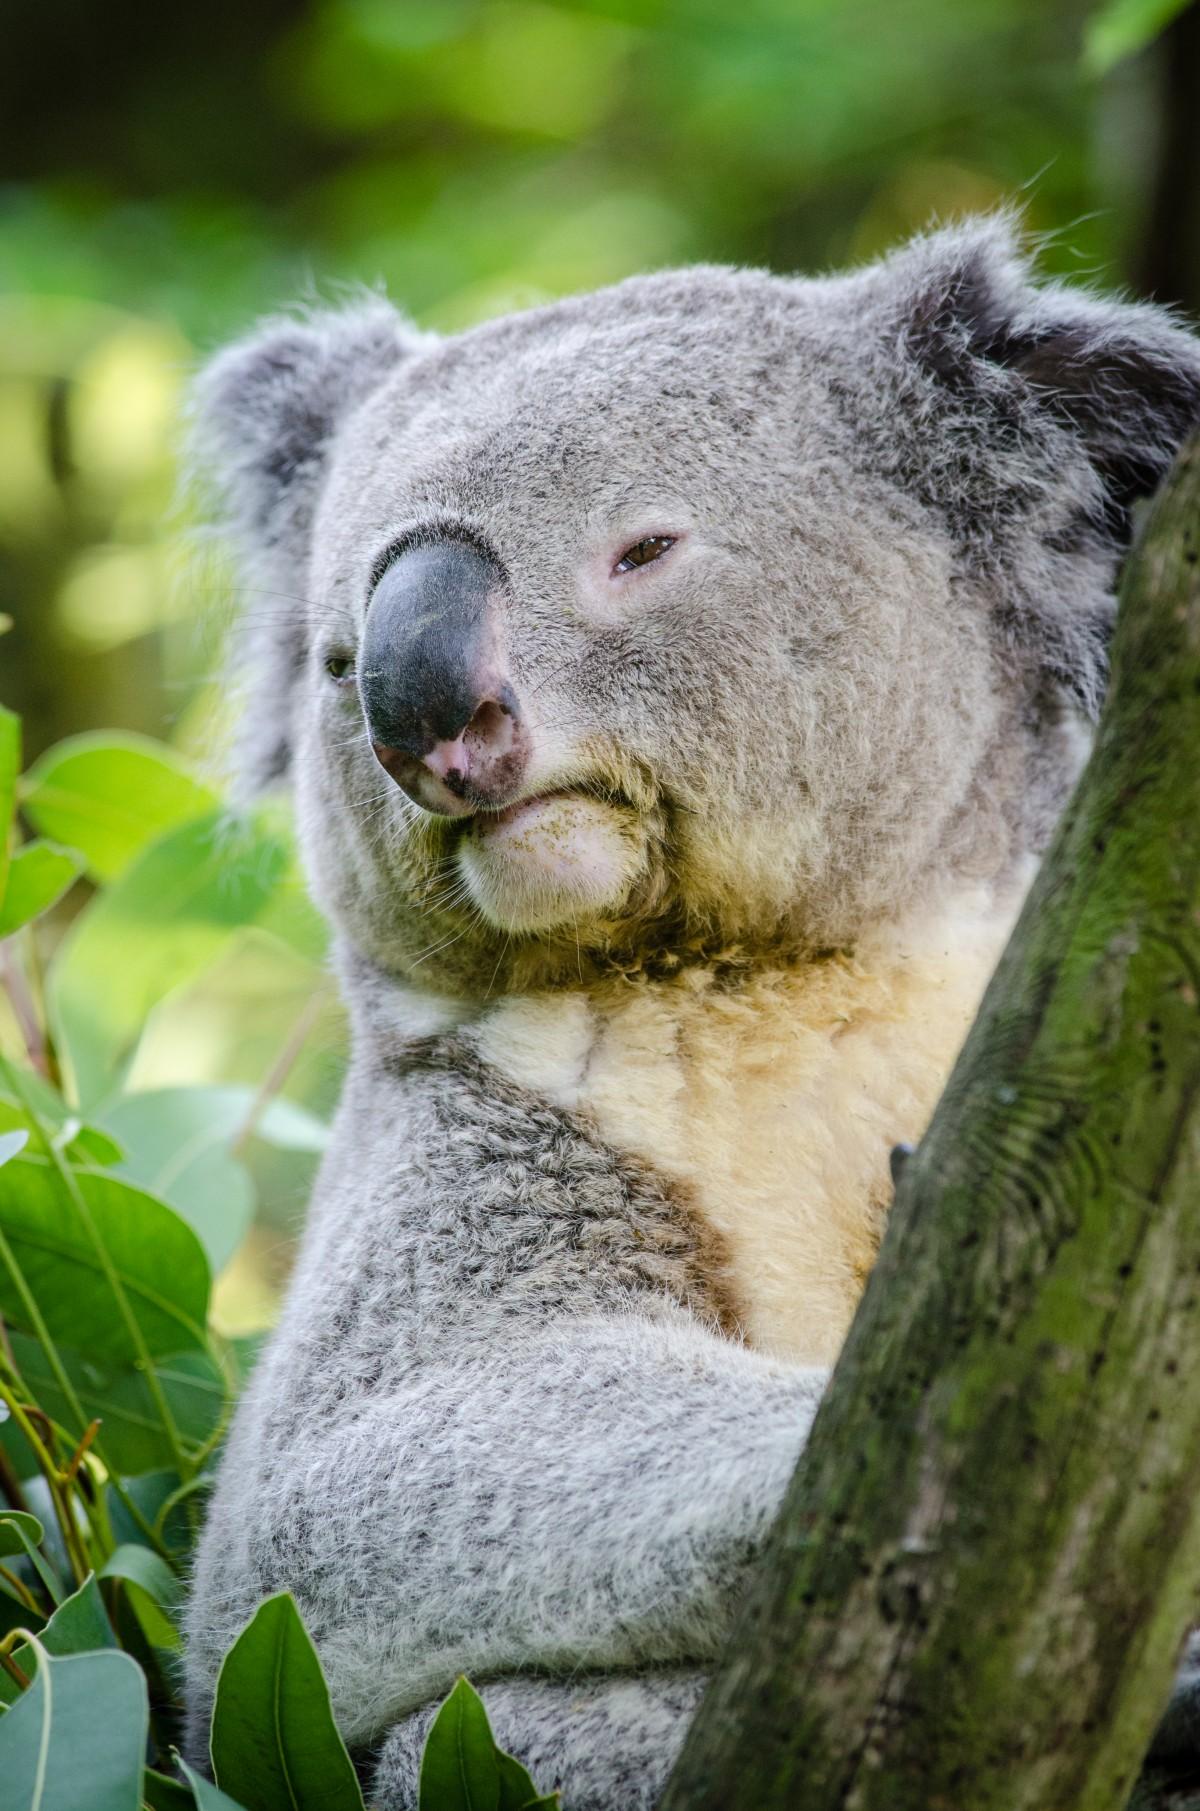 smiling koala picture - HD1200×1811